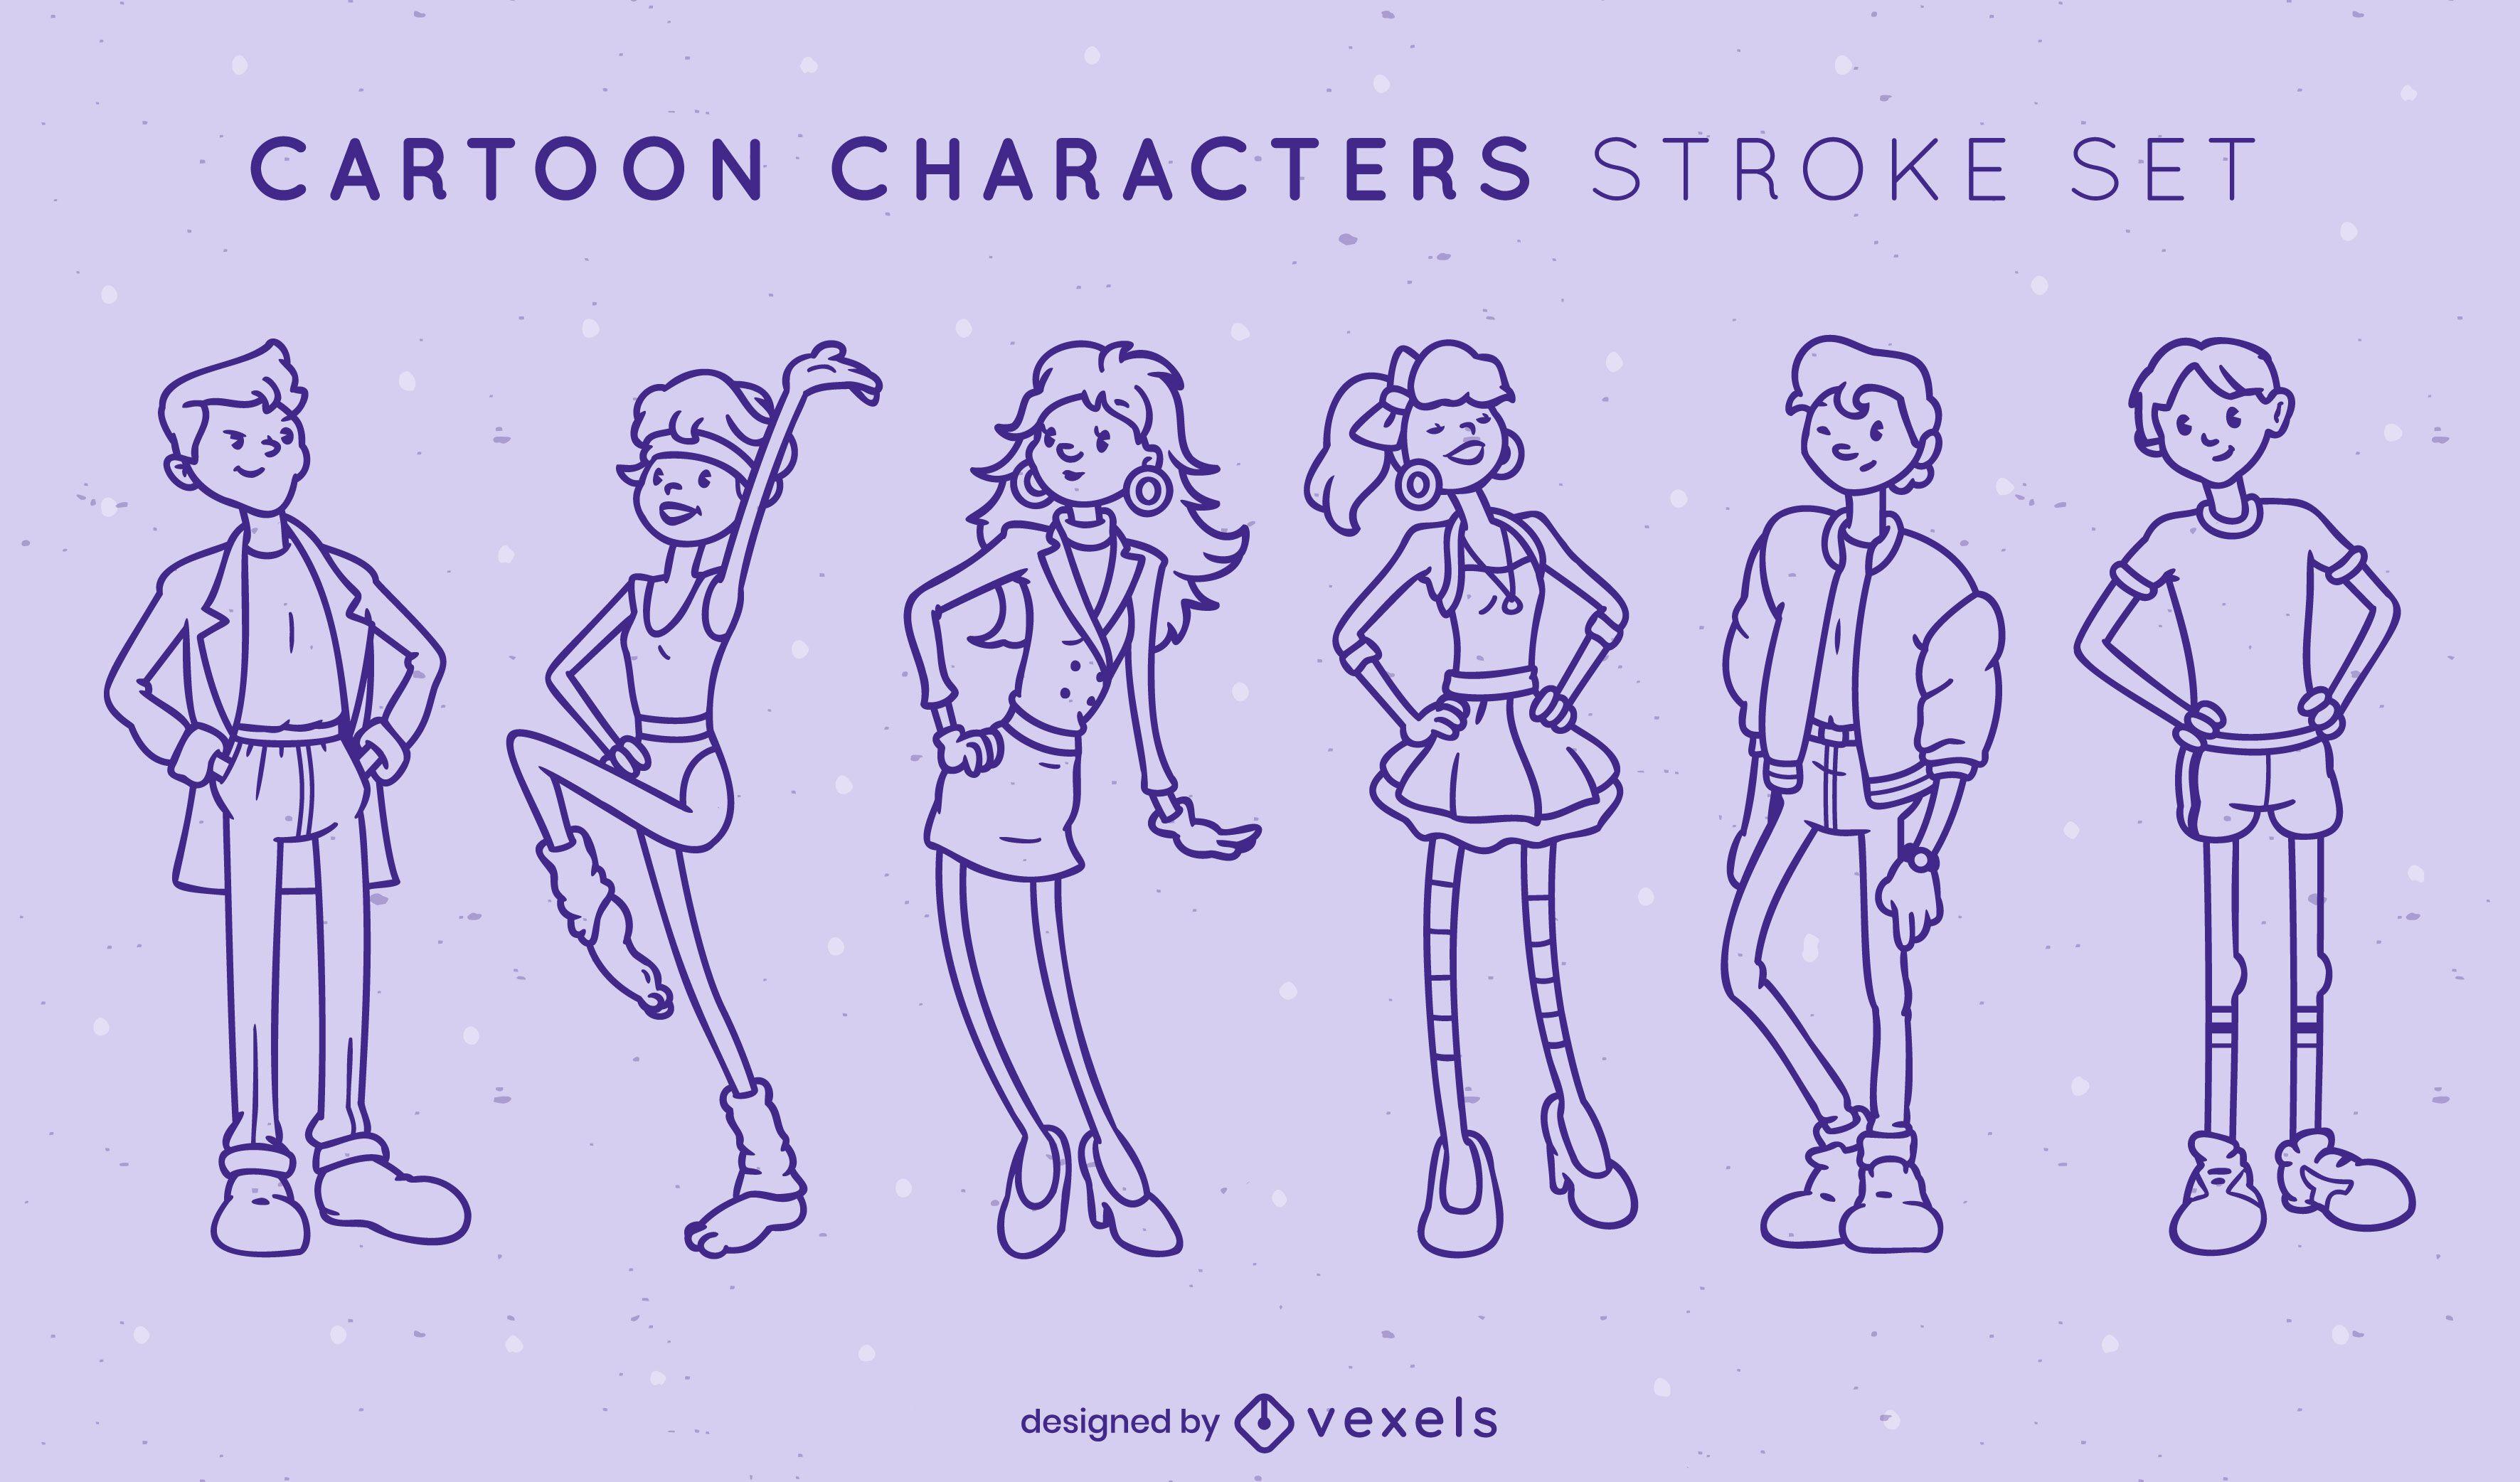 Cool set of cartoon characters stroke